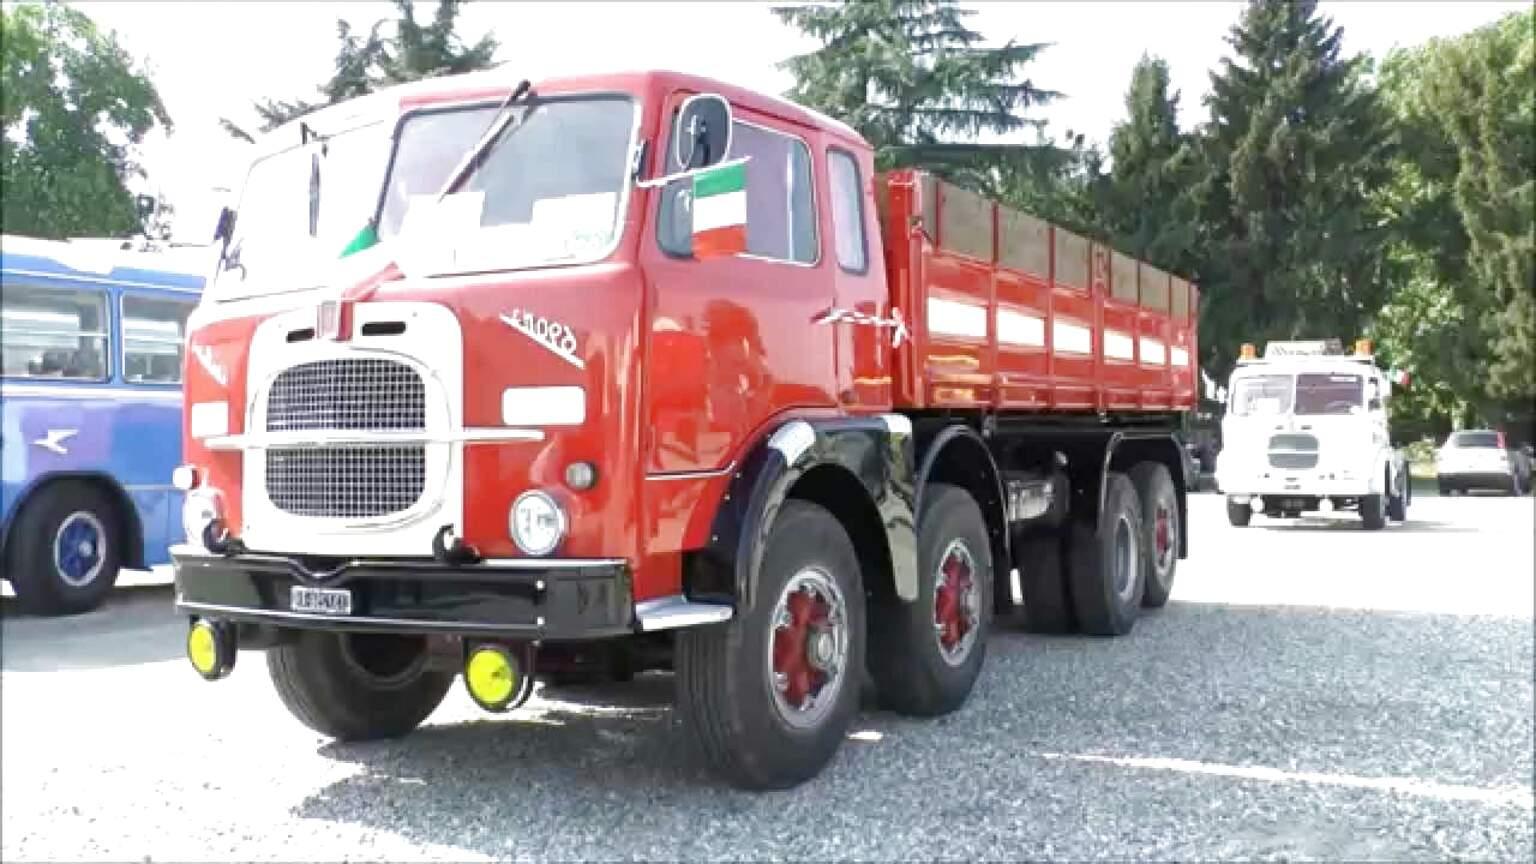 camion d epoca foto usato